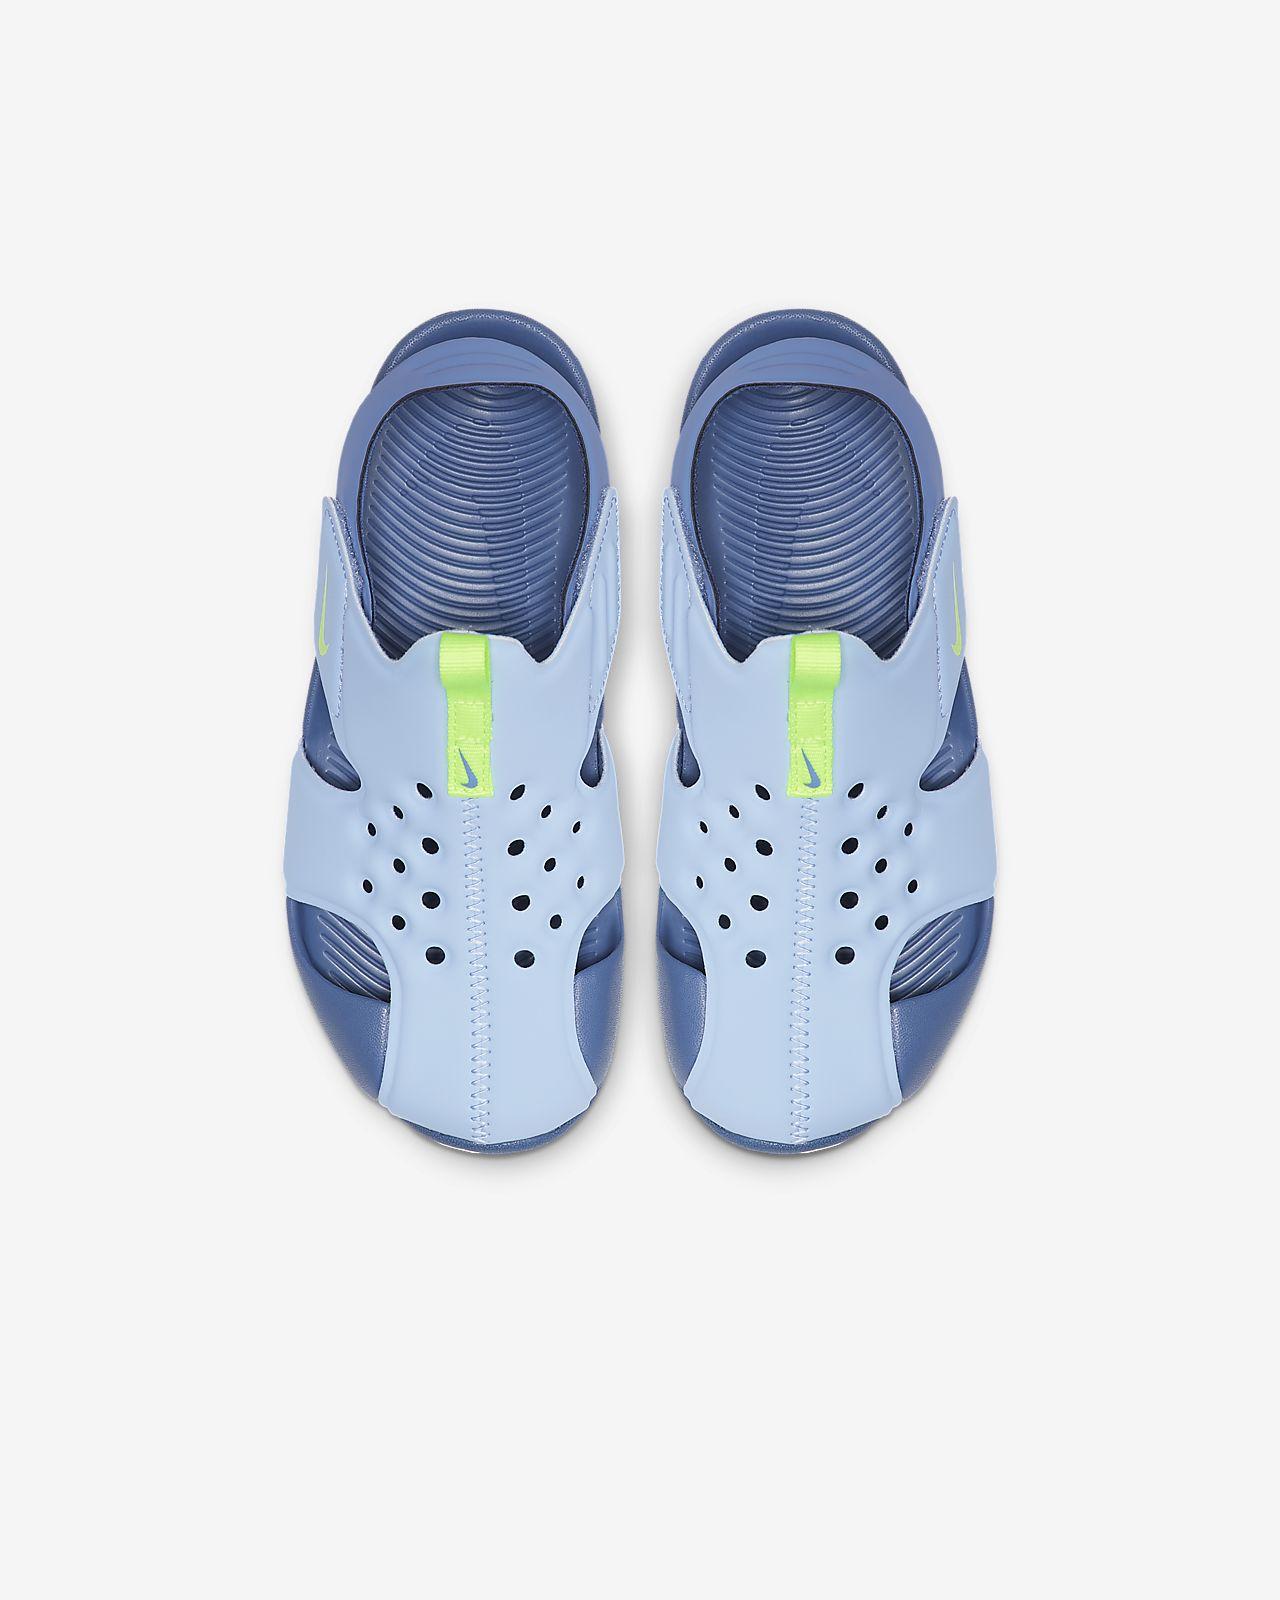 59cea0cb00b68b Nike Sunray Protect 2 Younger Kids  Sandal. Nike.com GB